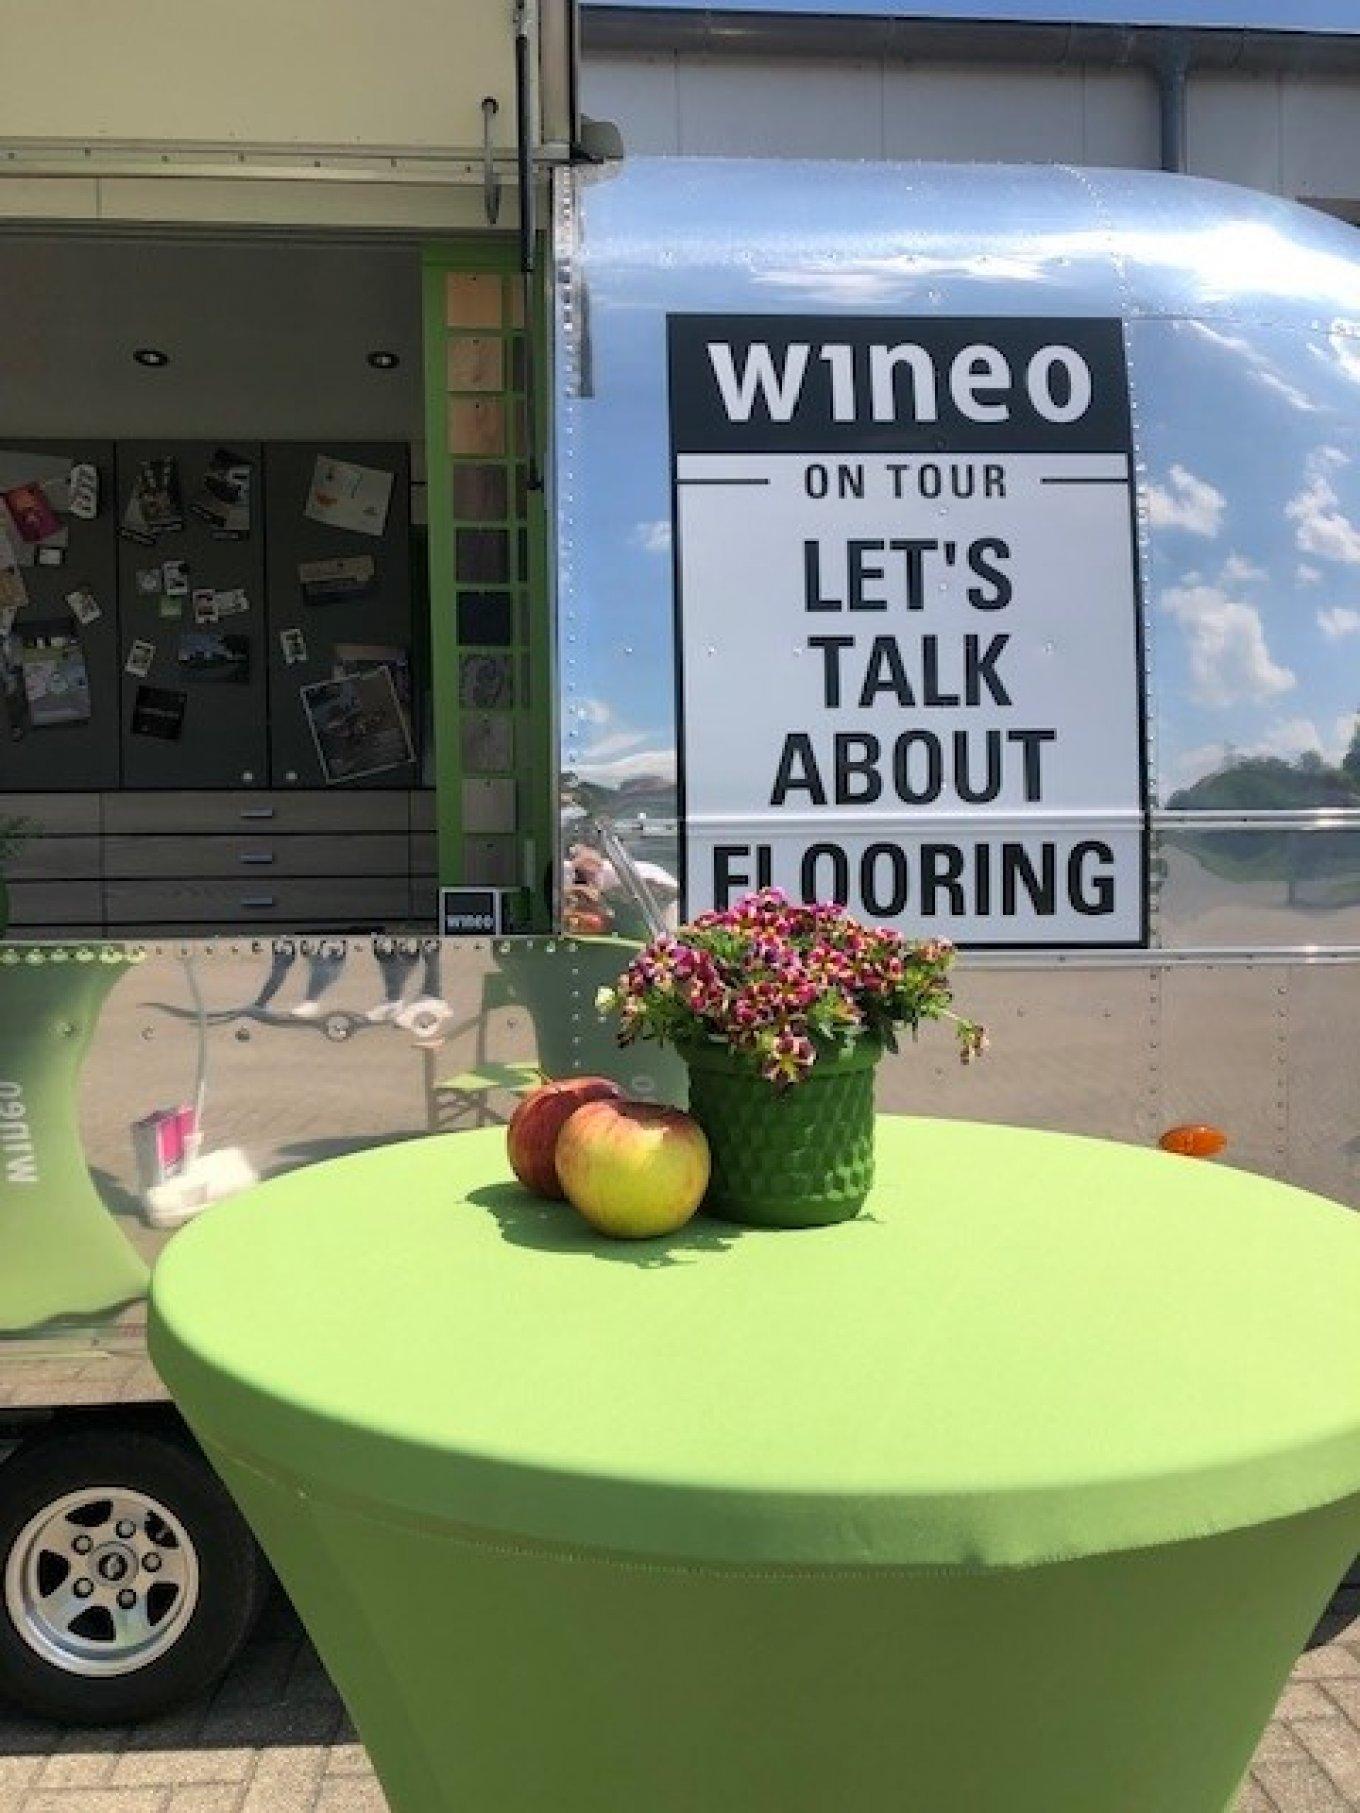 wineo Roadshow Airstream Caravan Dekoration Blumen Äpfel Lets talk about flooring